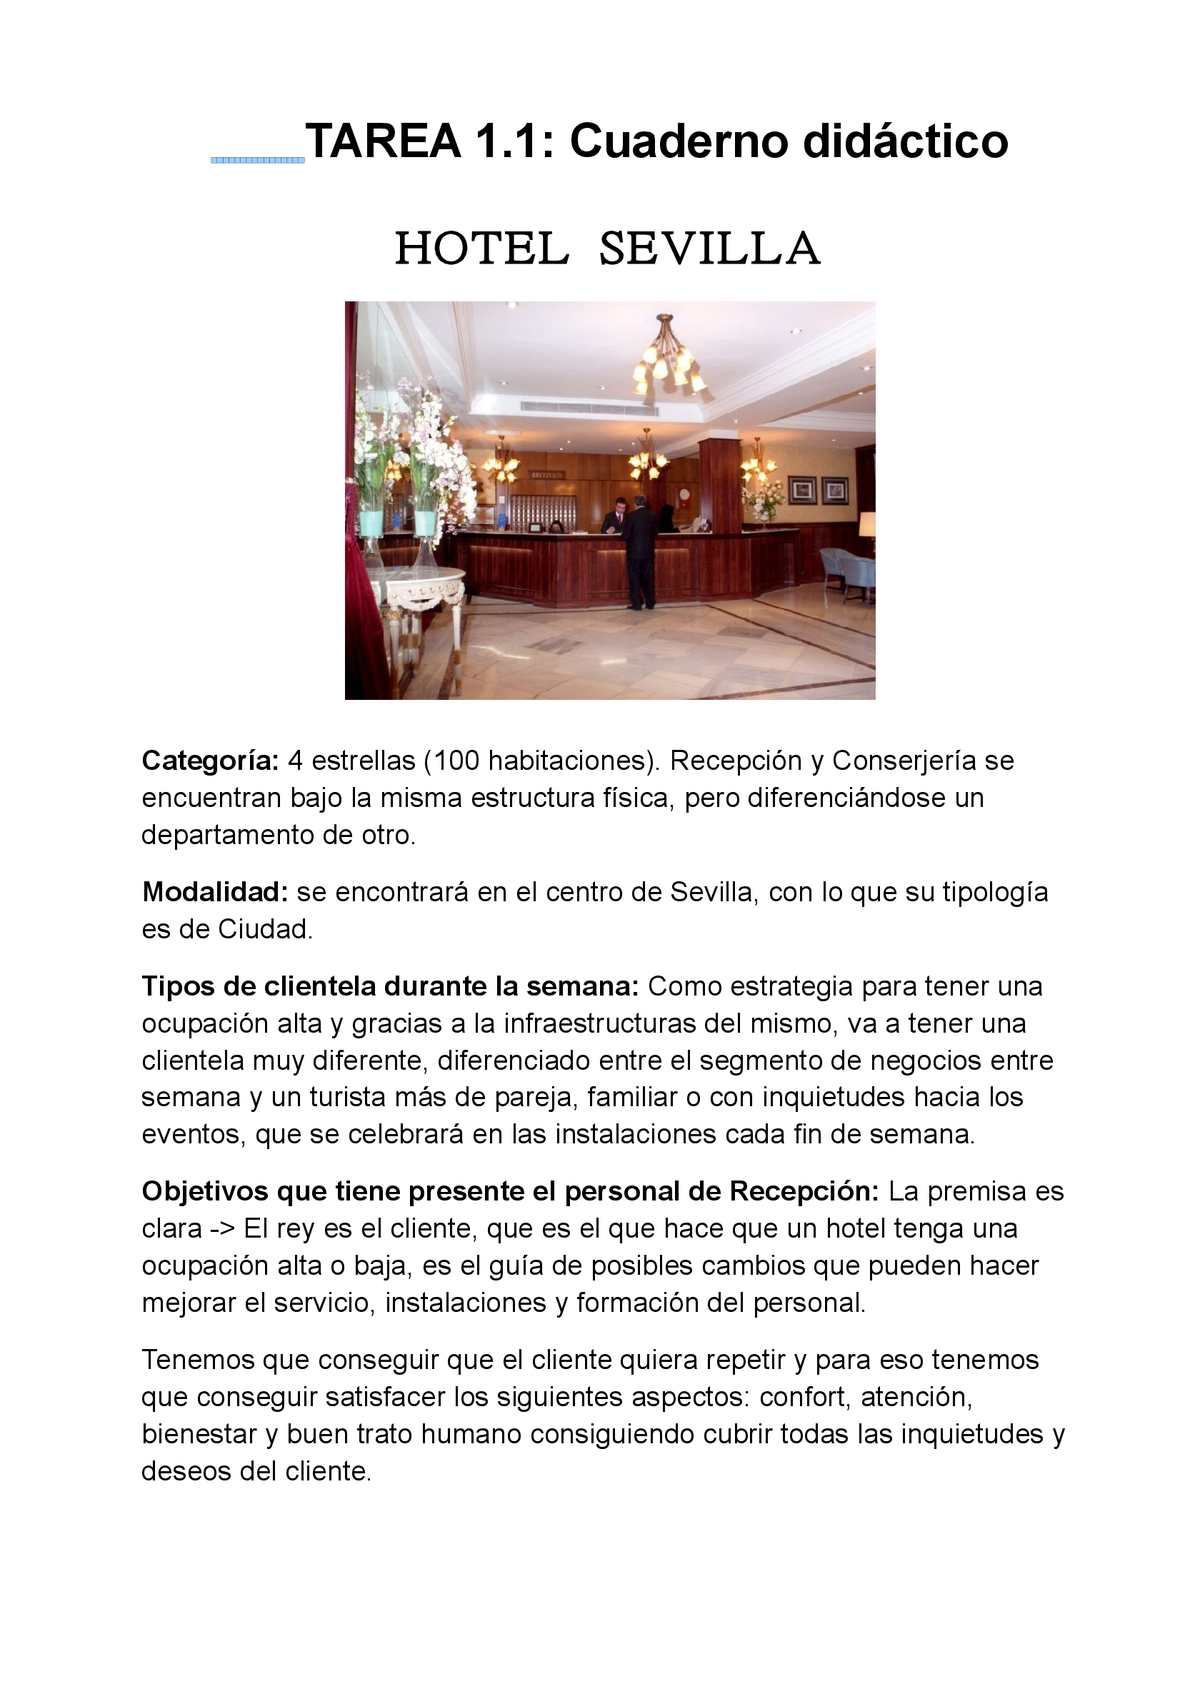 La misma recepcionista de hotel - 3 part 5